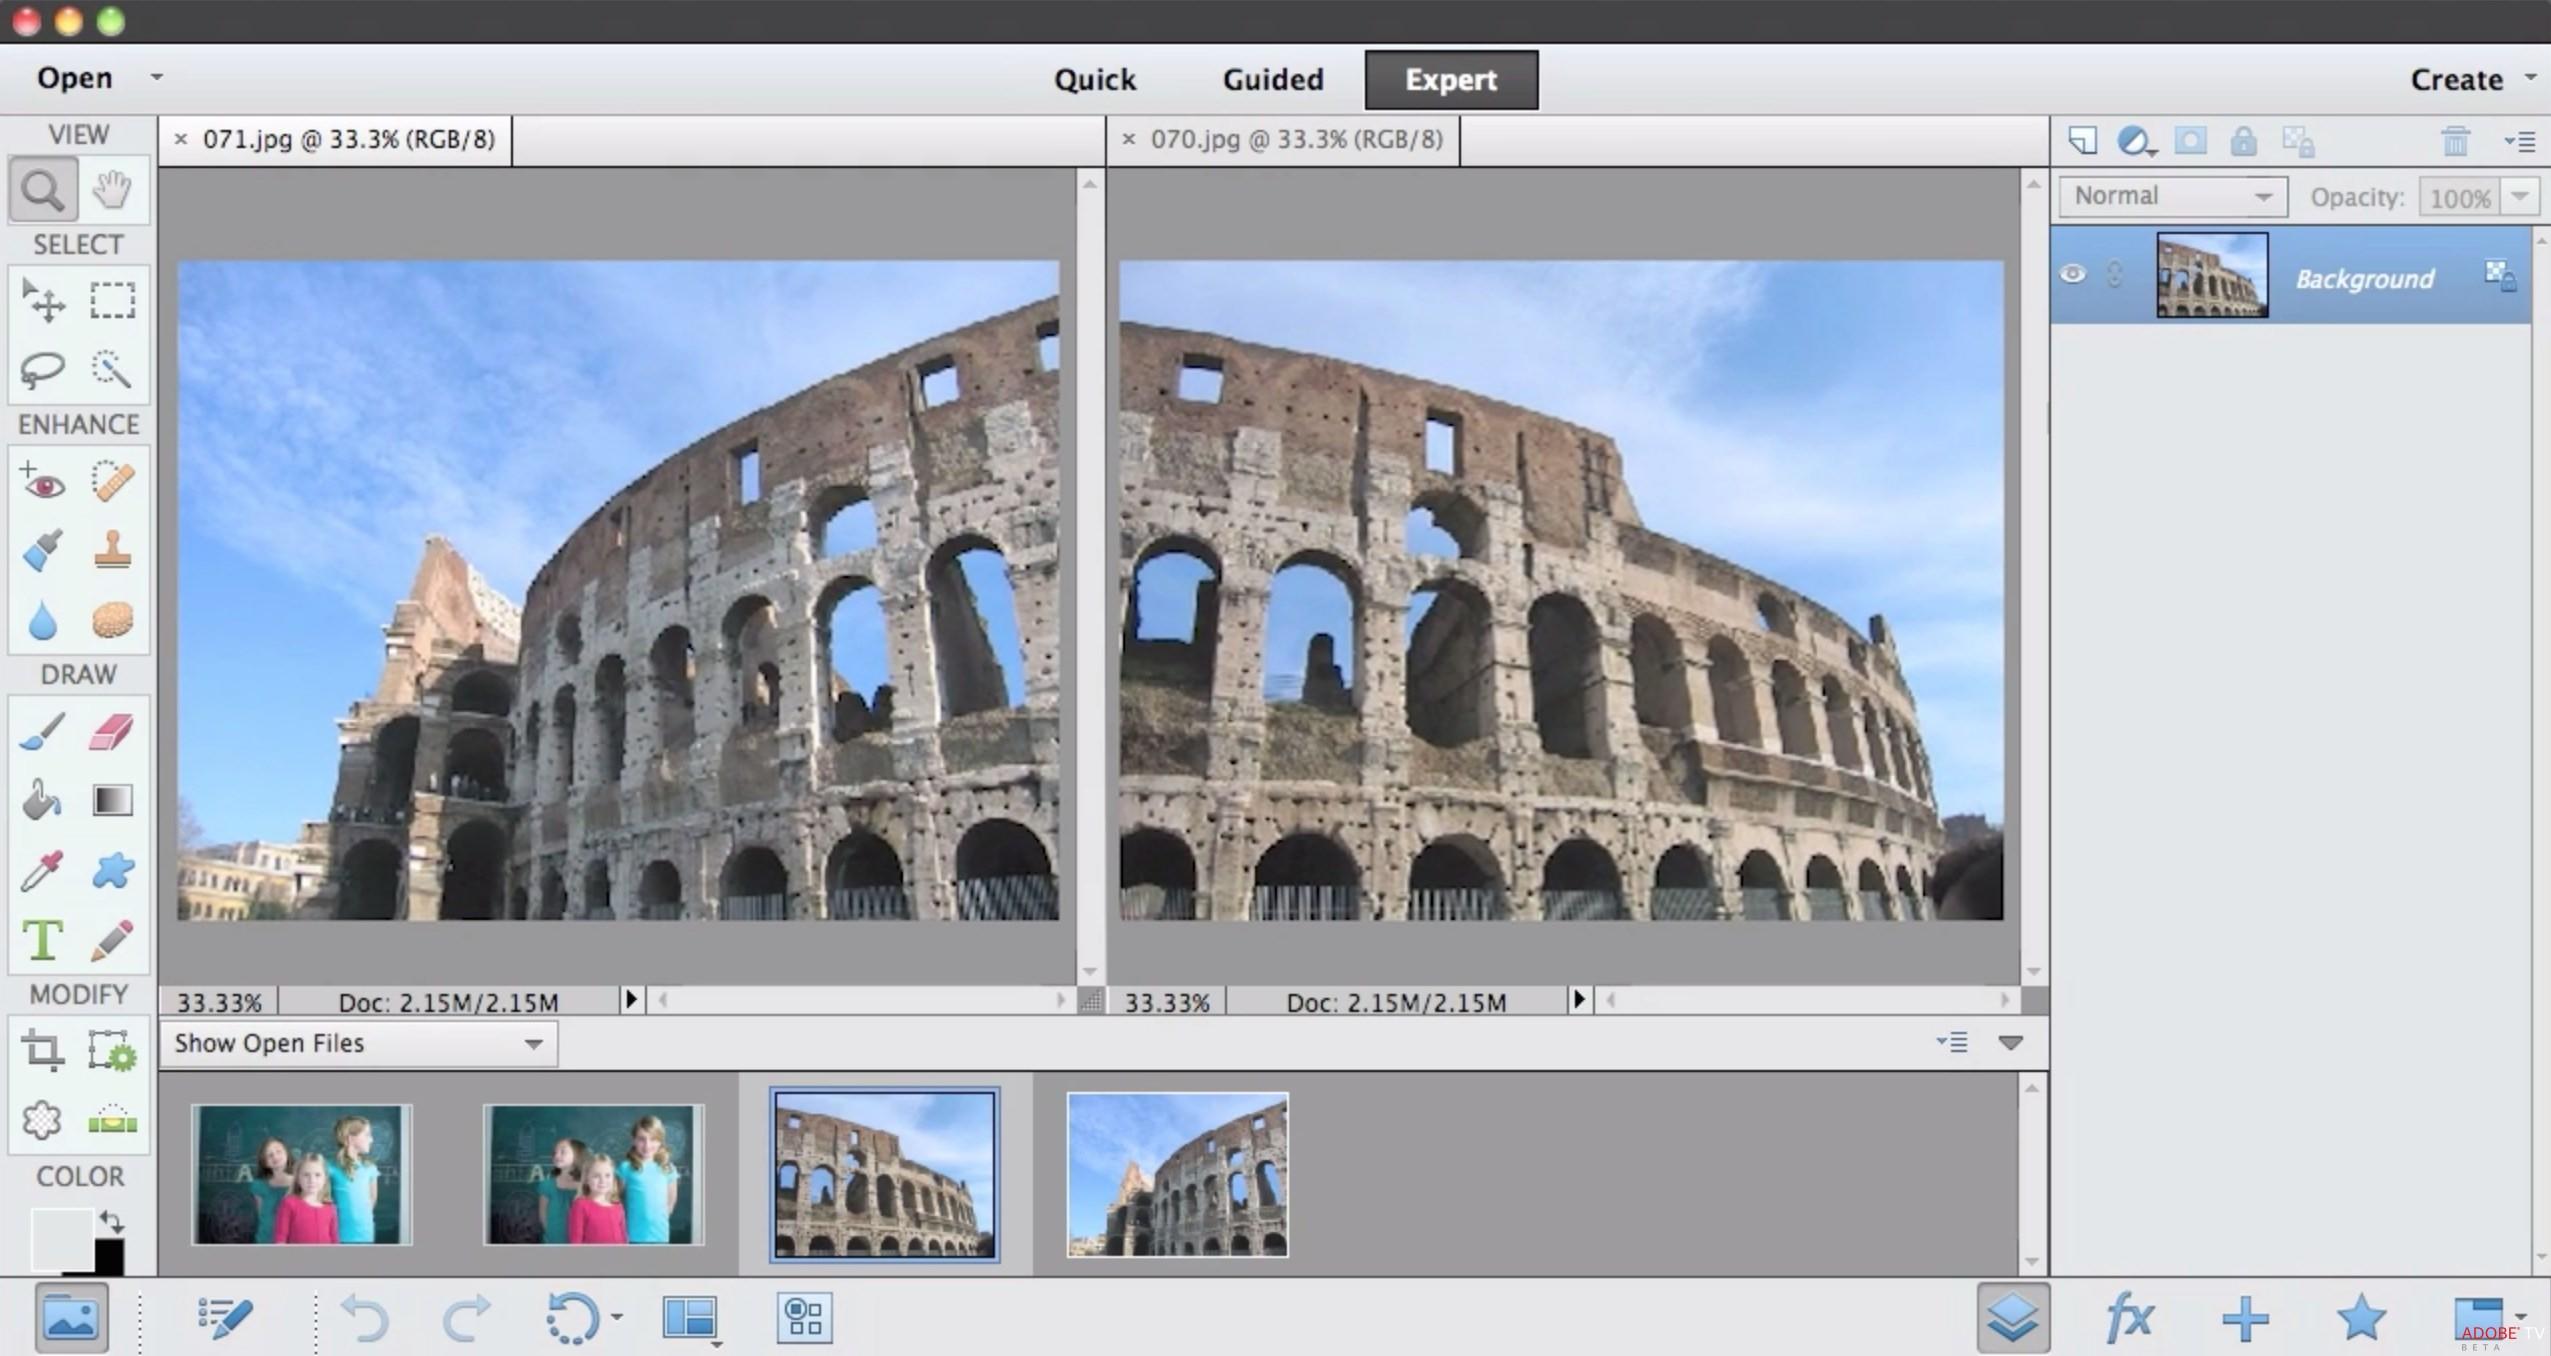 Photoshop Elements 20 Infos, Preise, Download